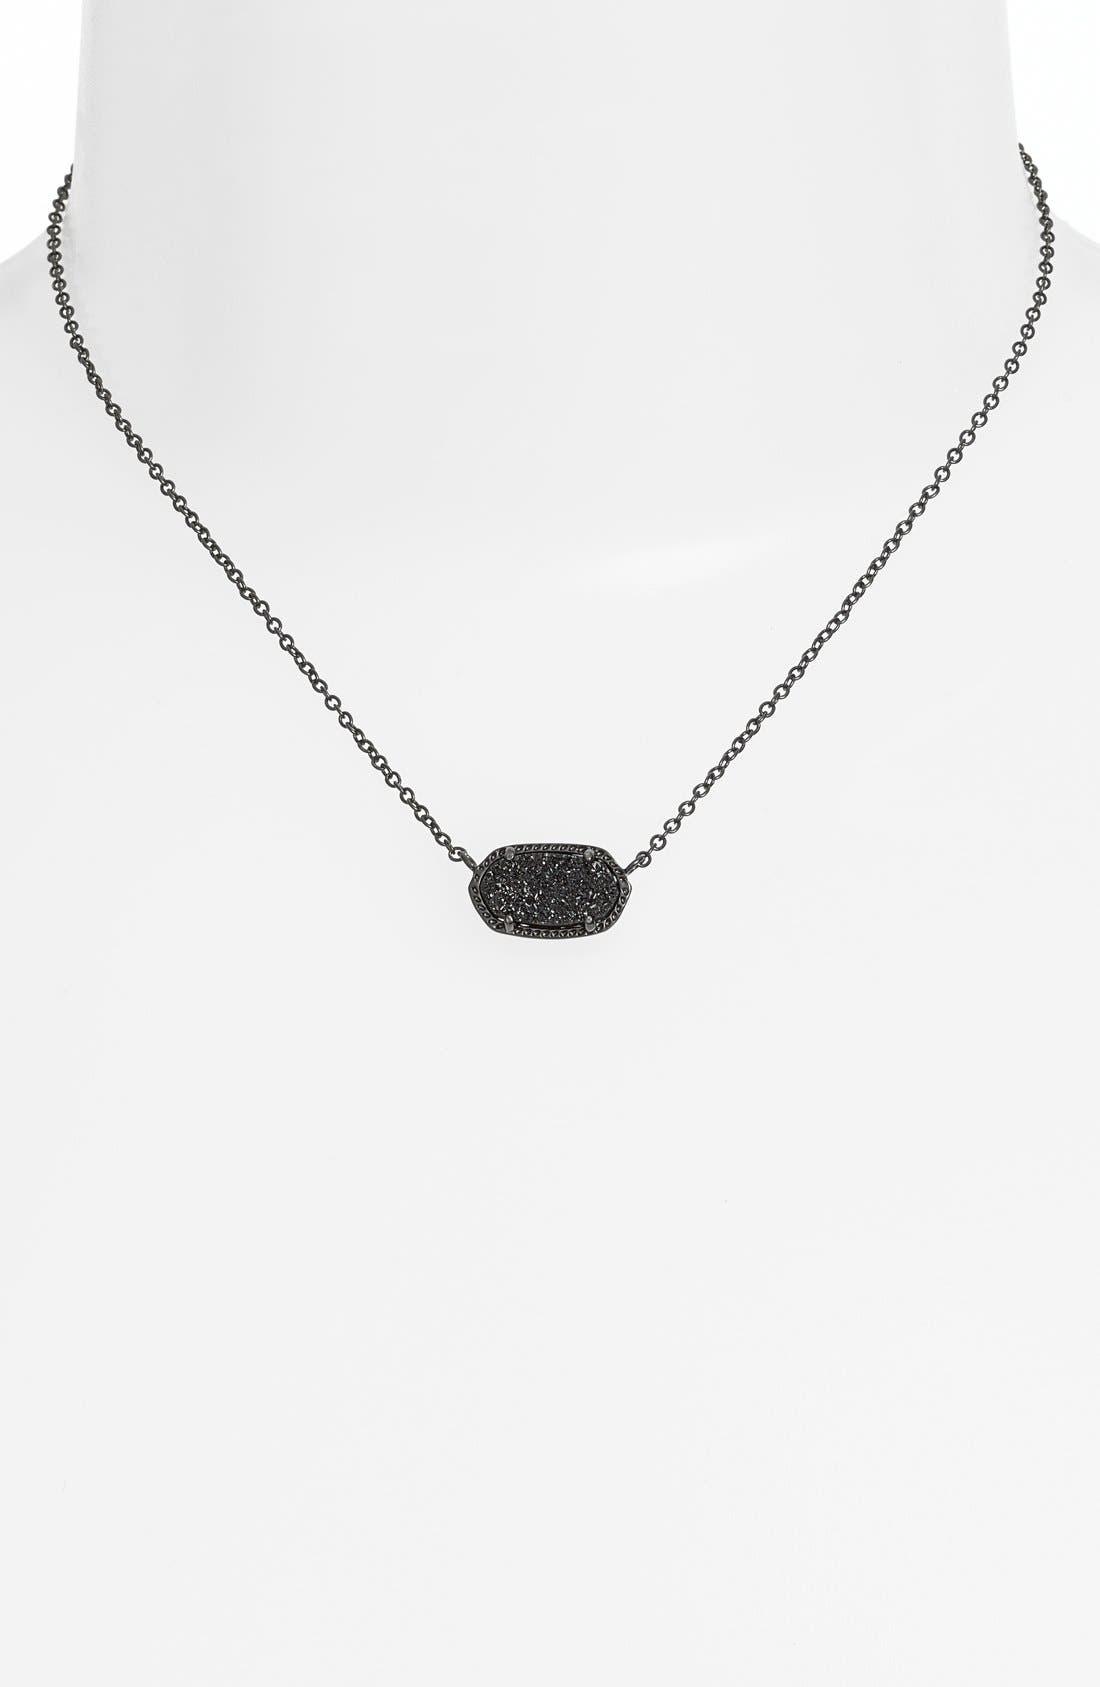 Elisa Filigree Pendant Necklace,                         Main,                         color, GUNMETAL/ BLACK DRUSY